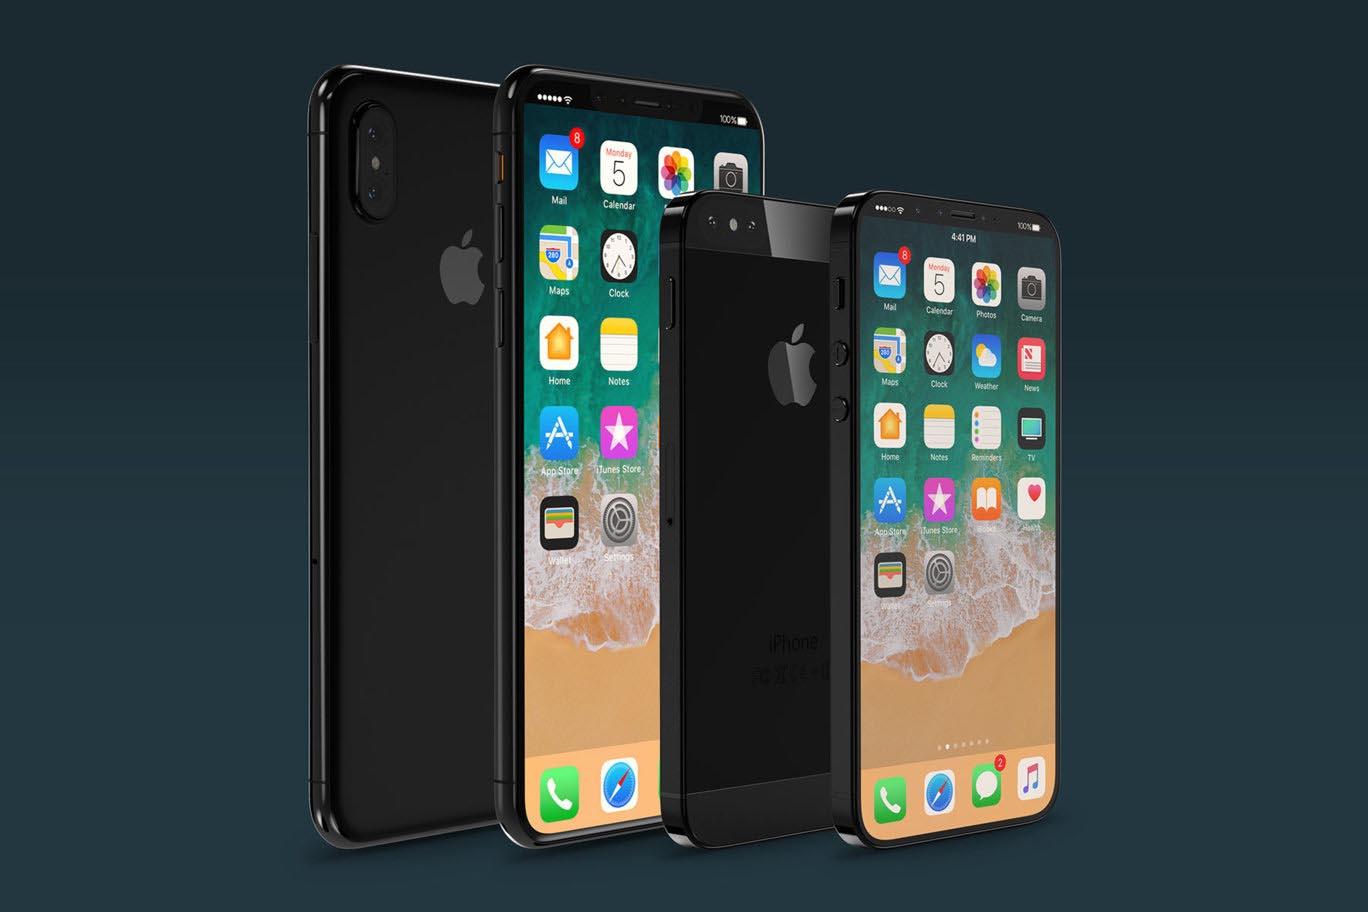 iPhone X SE concept